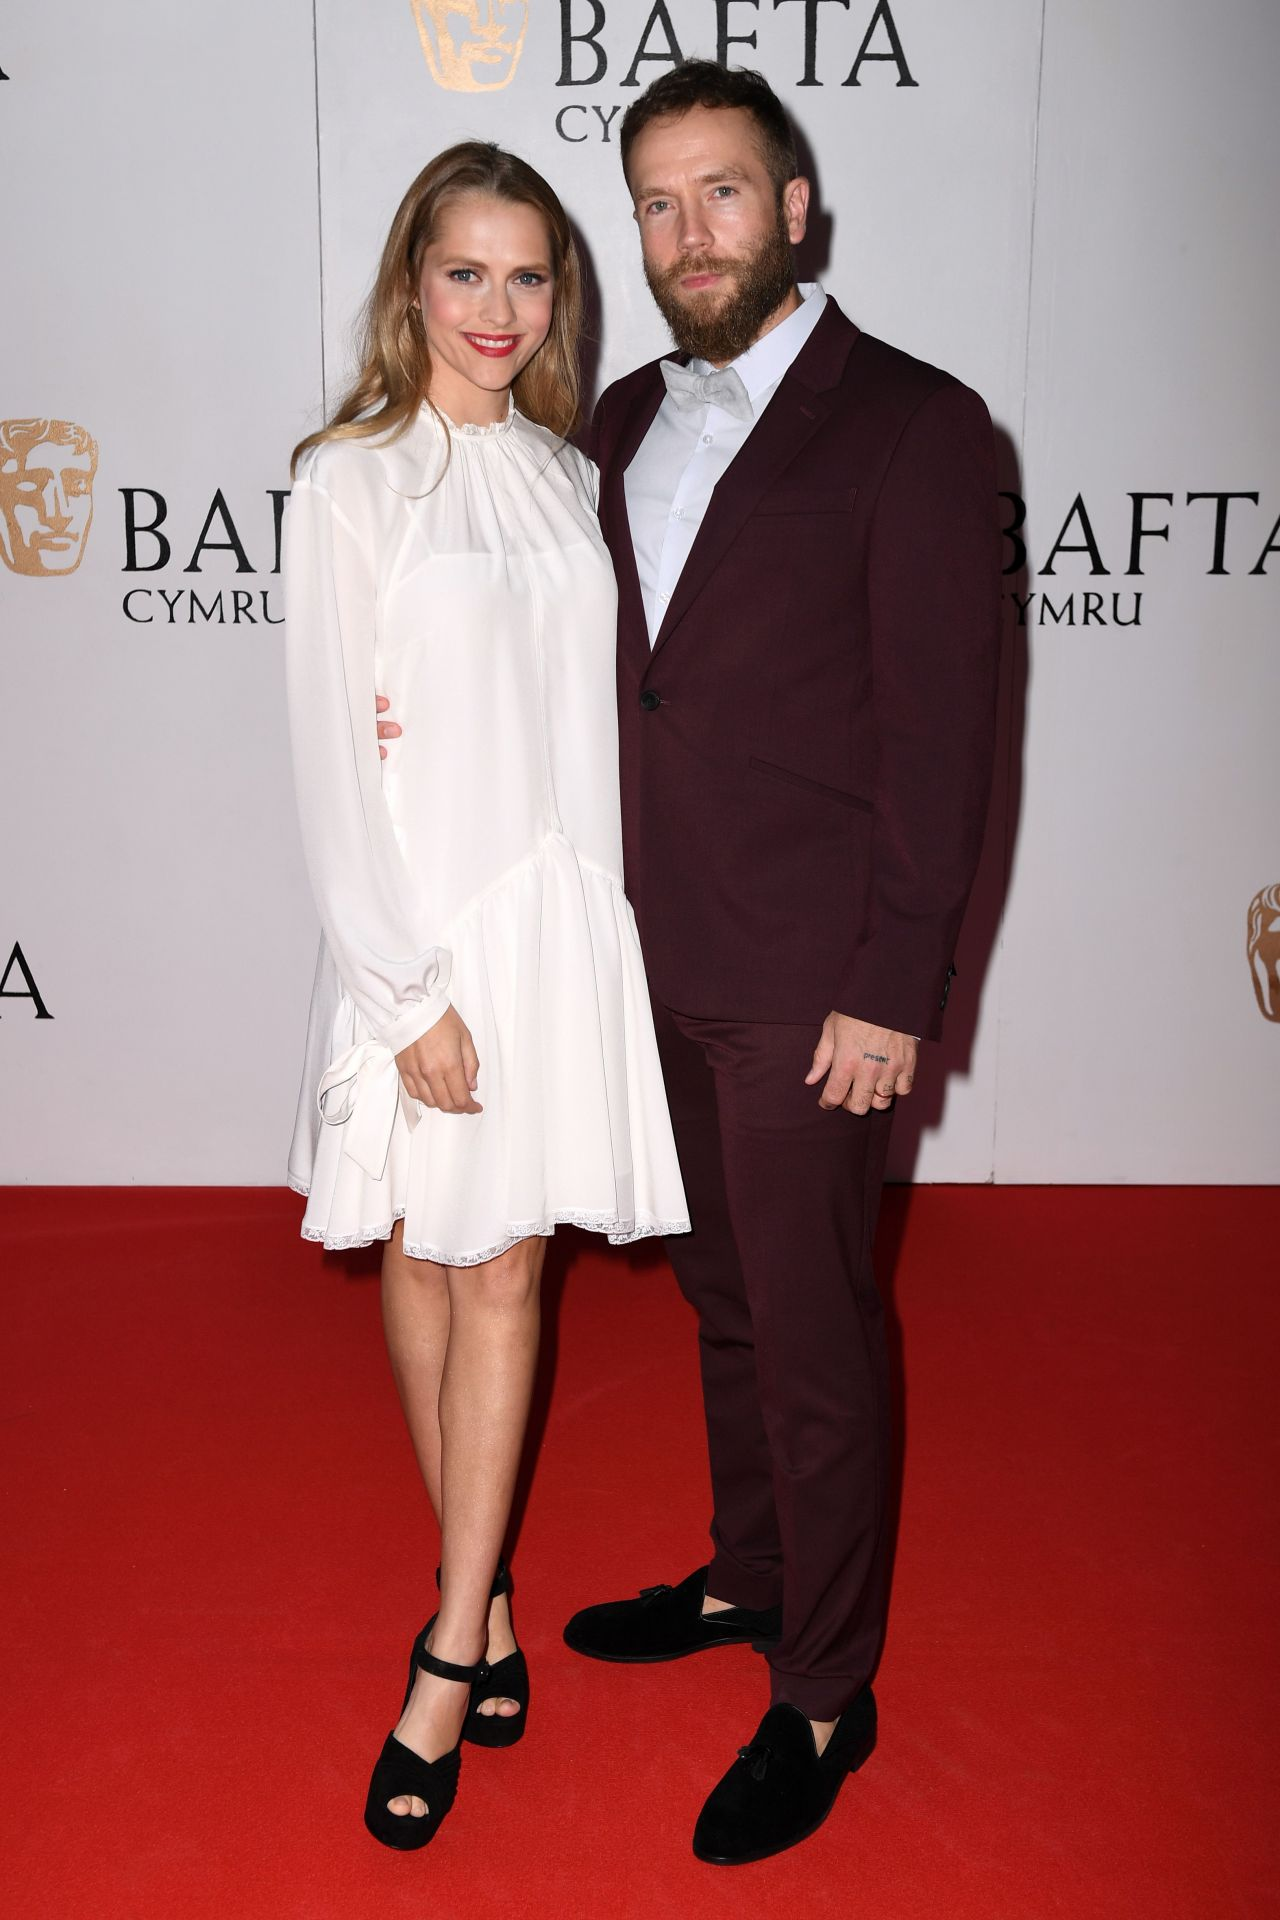 http://celebmafia.com/wp-content/uploads/2017/10/teresa-palmer-british-academy-cymru-awards-2017-in-cardiff-0.jpg